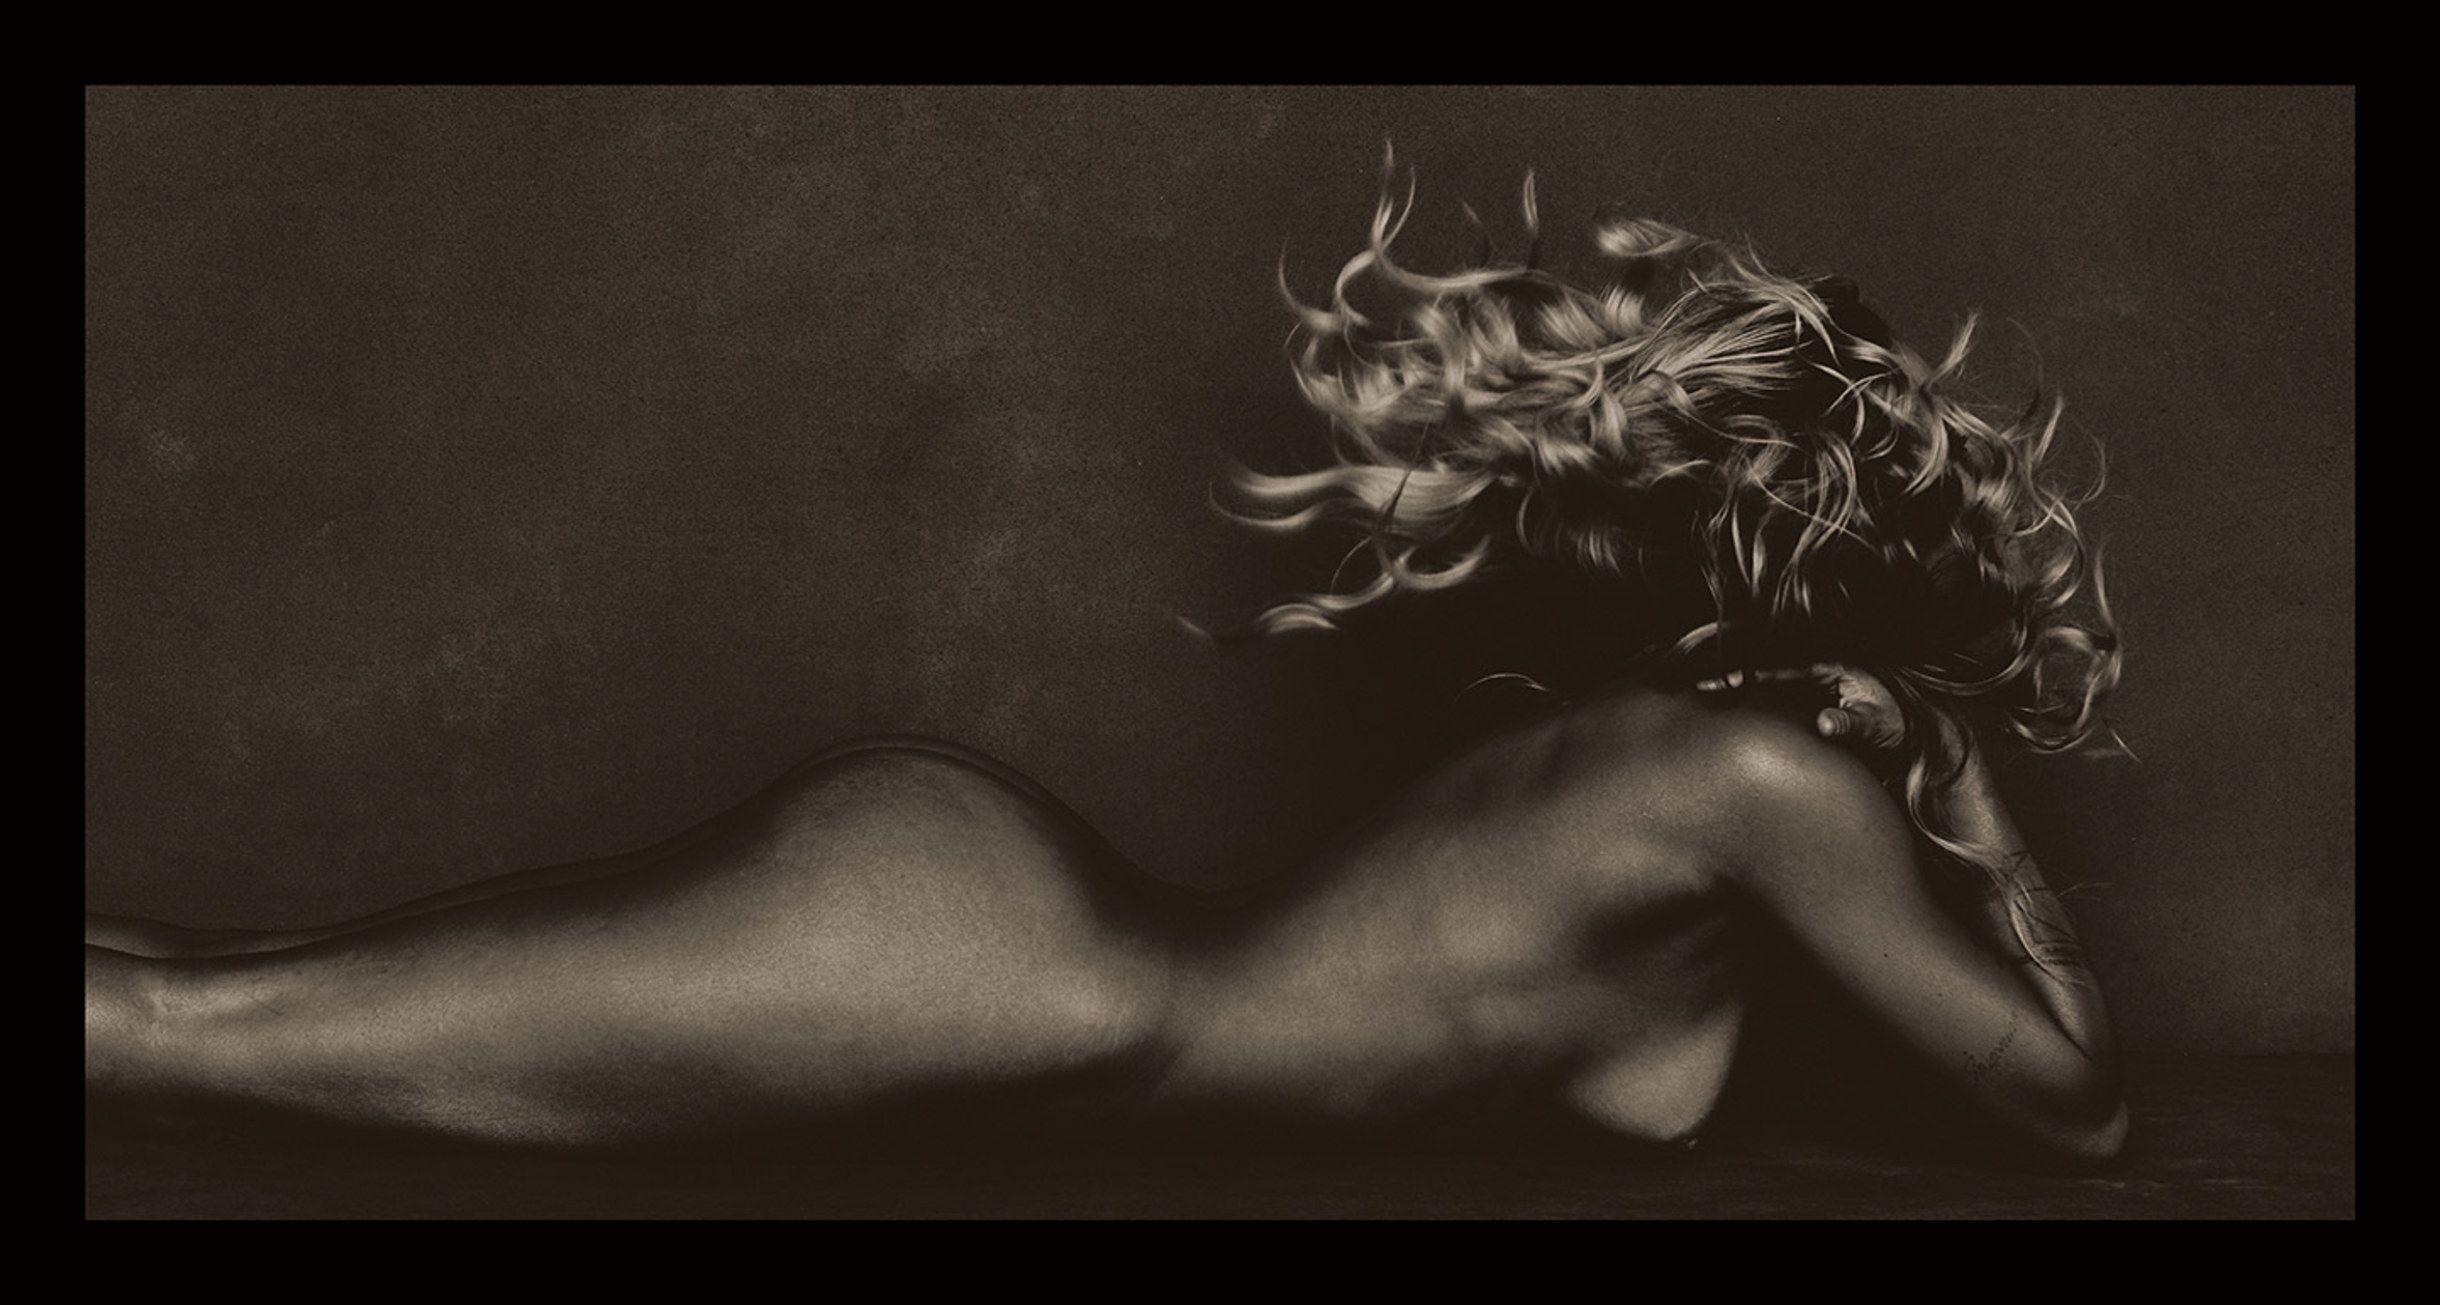 Kourtney Kardashian Poses Completely Naked In Jaw